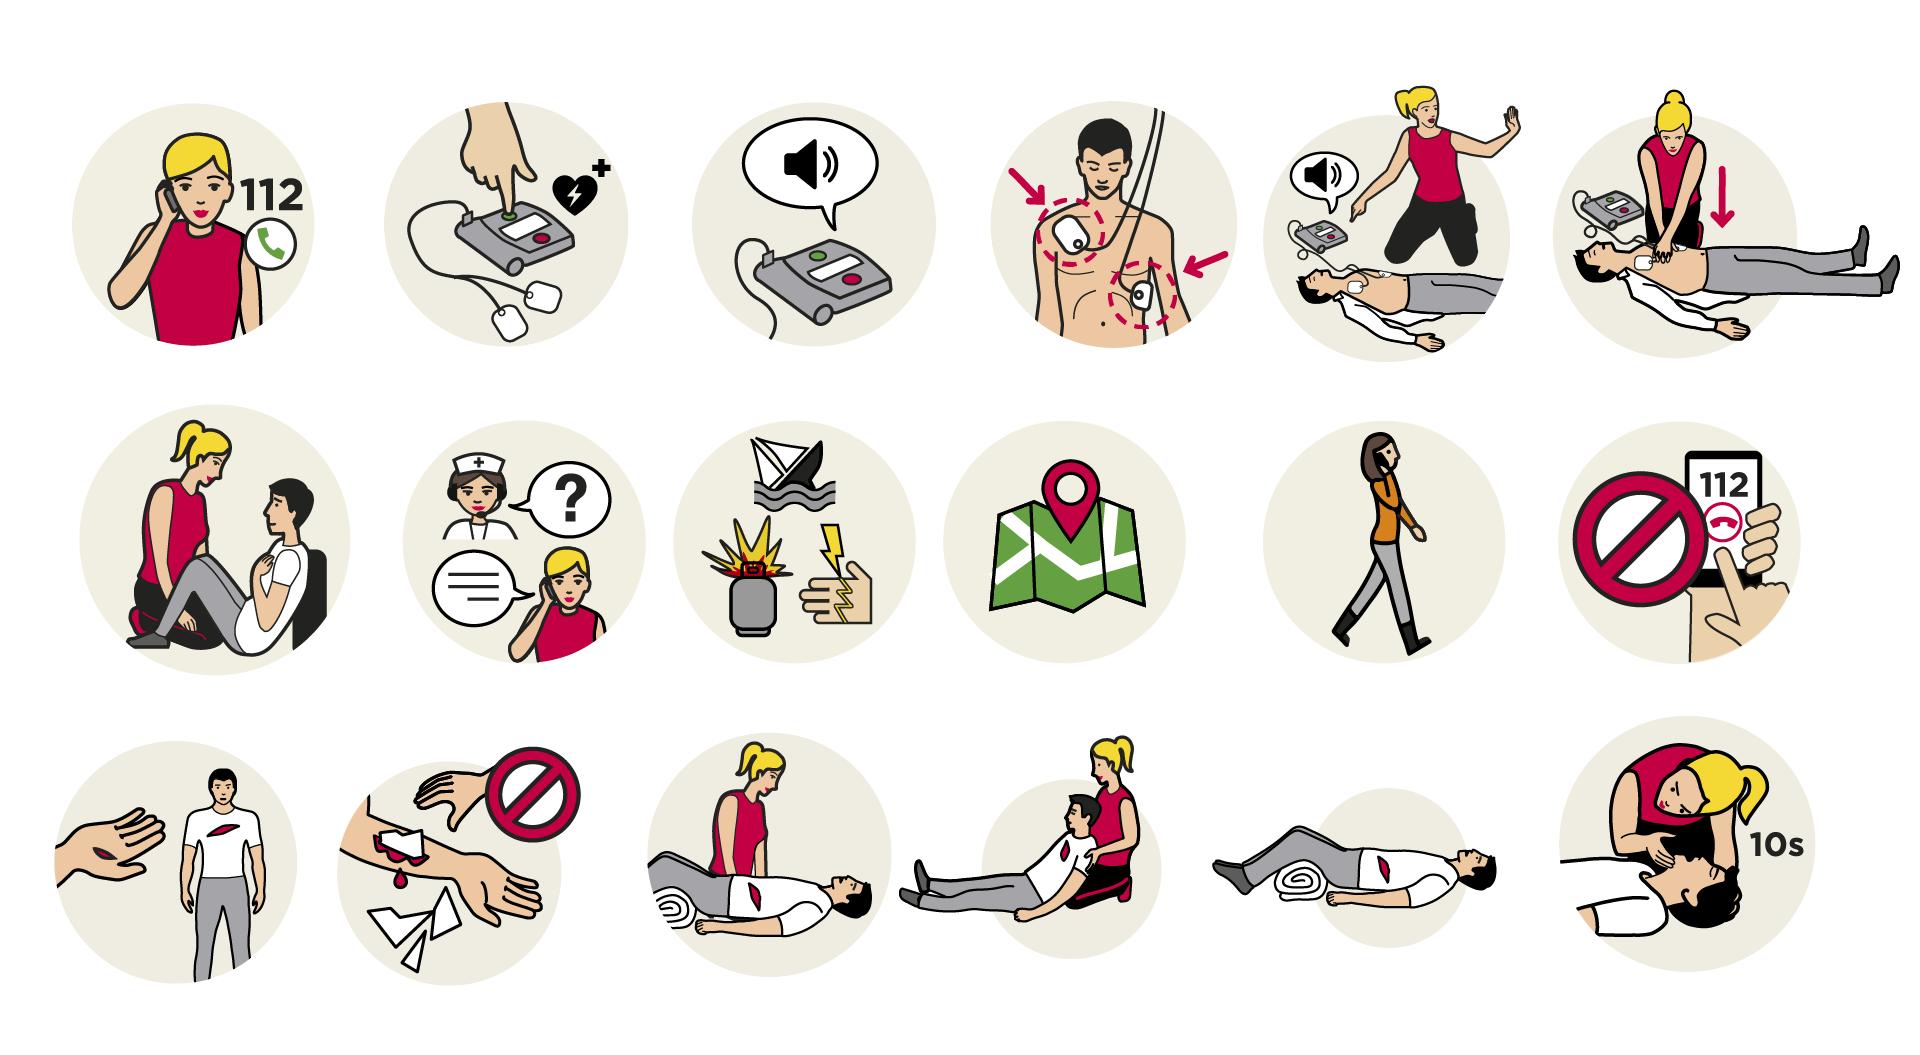 Secourisme illustrations